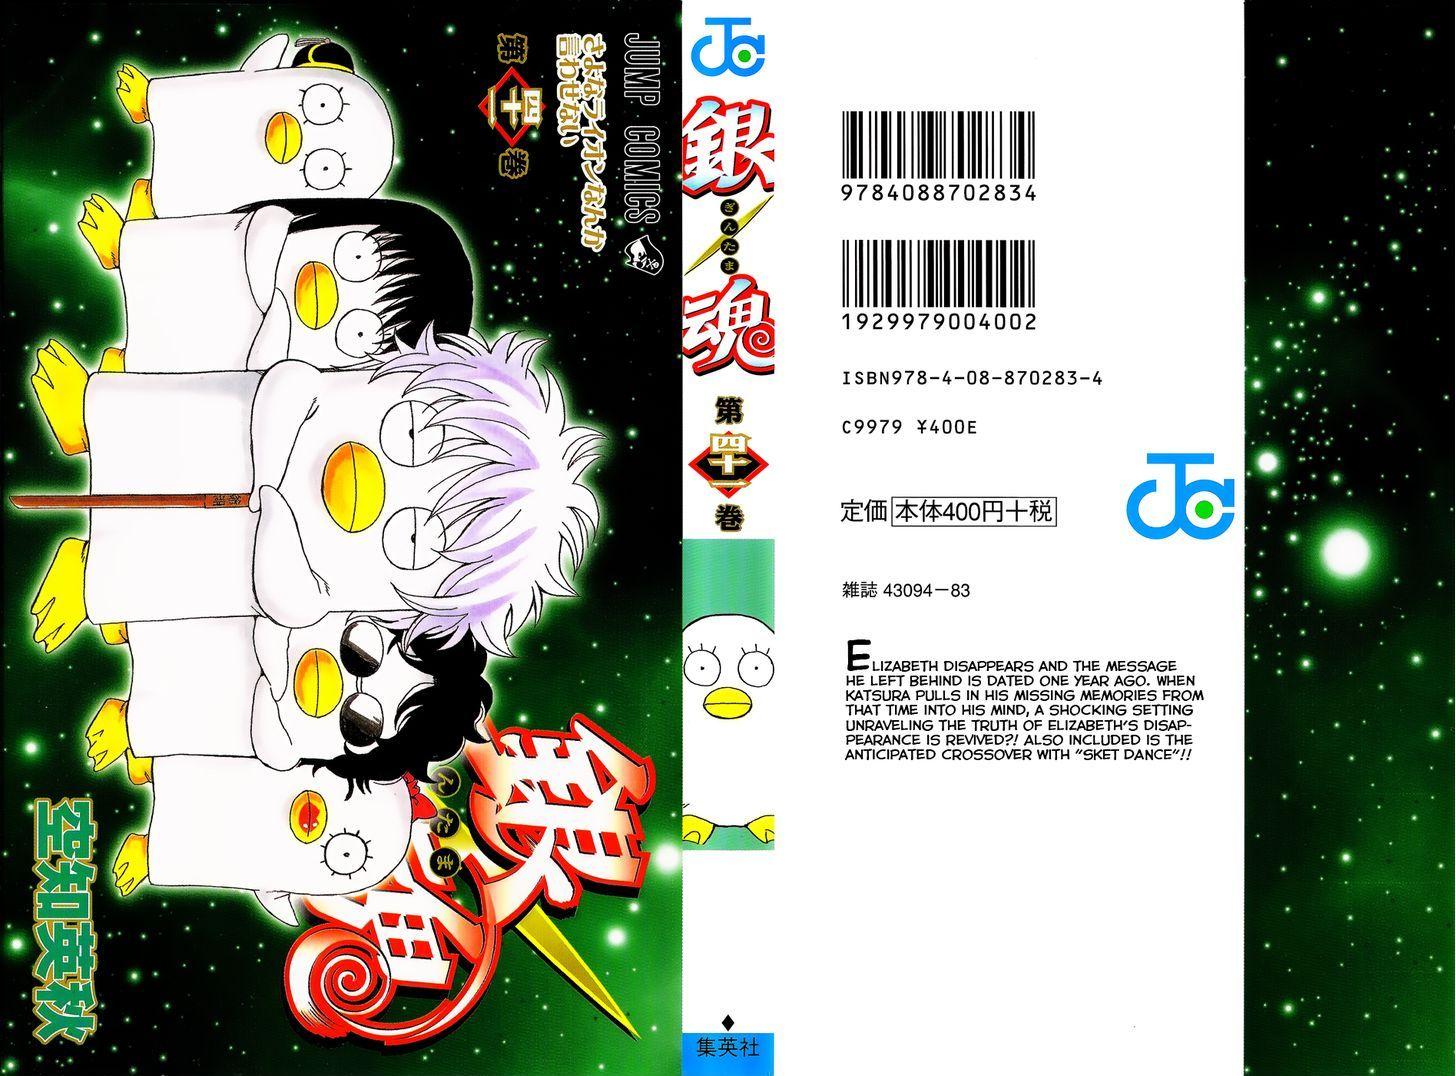 https://im.nineanime.com/comics/pic9/18/210/17249/Gintama3530869.jpg Page 1